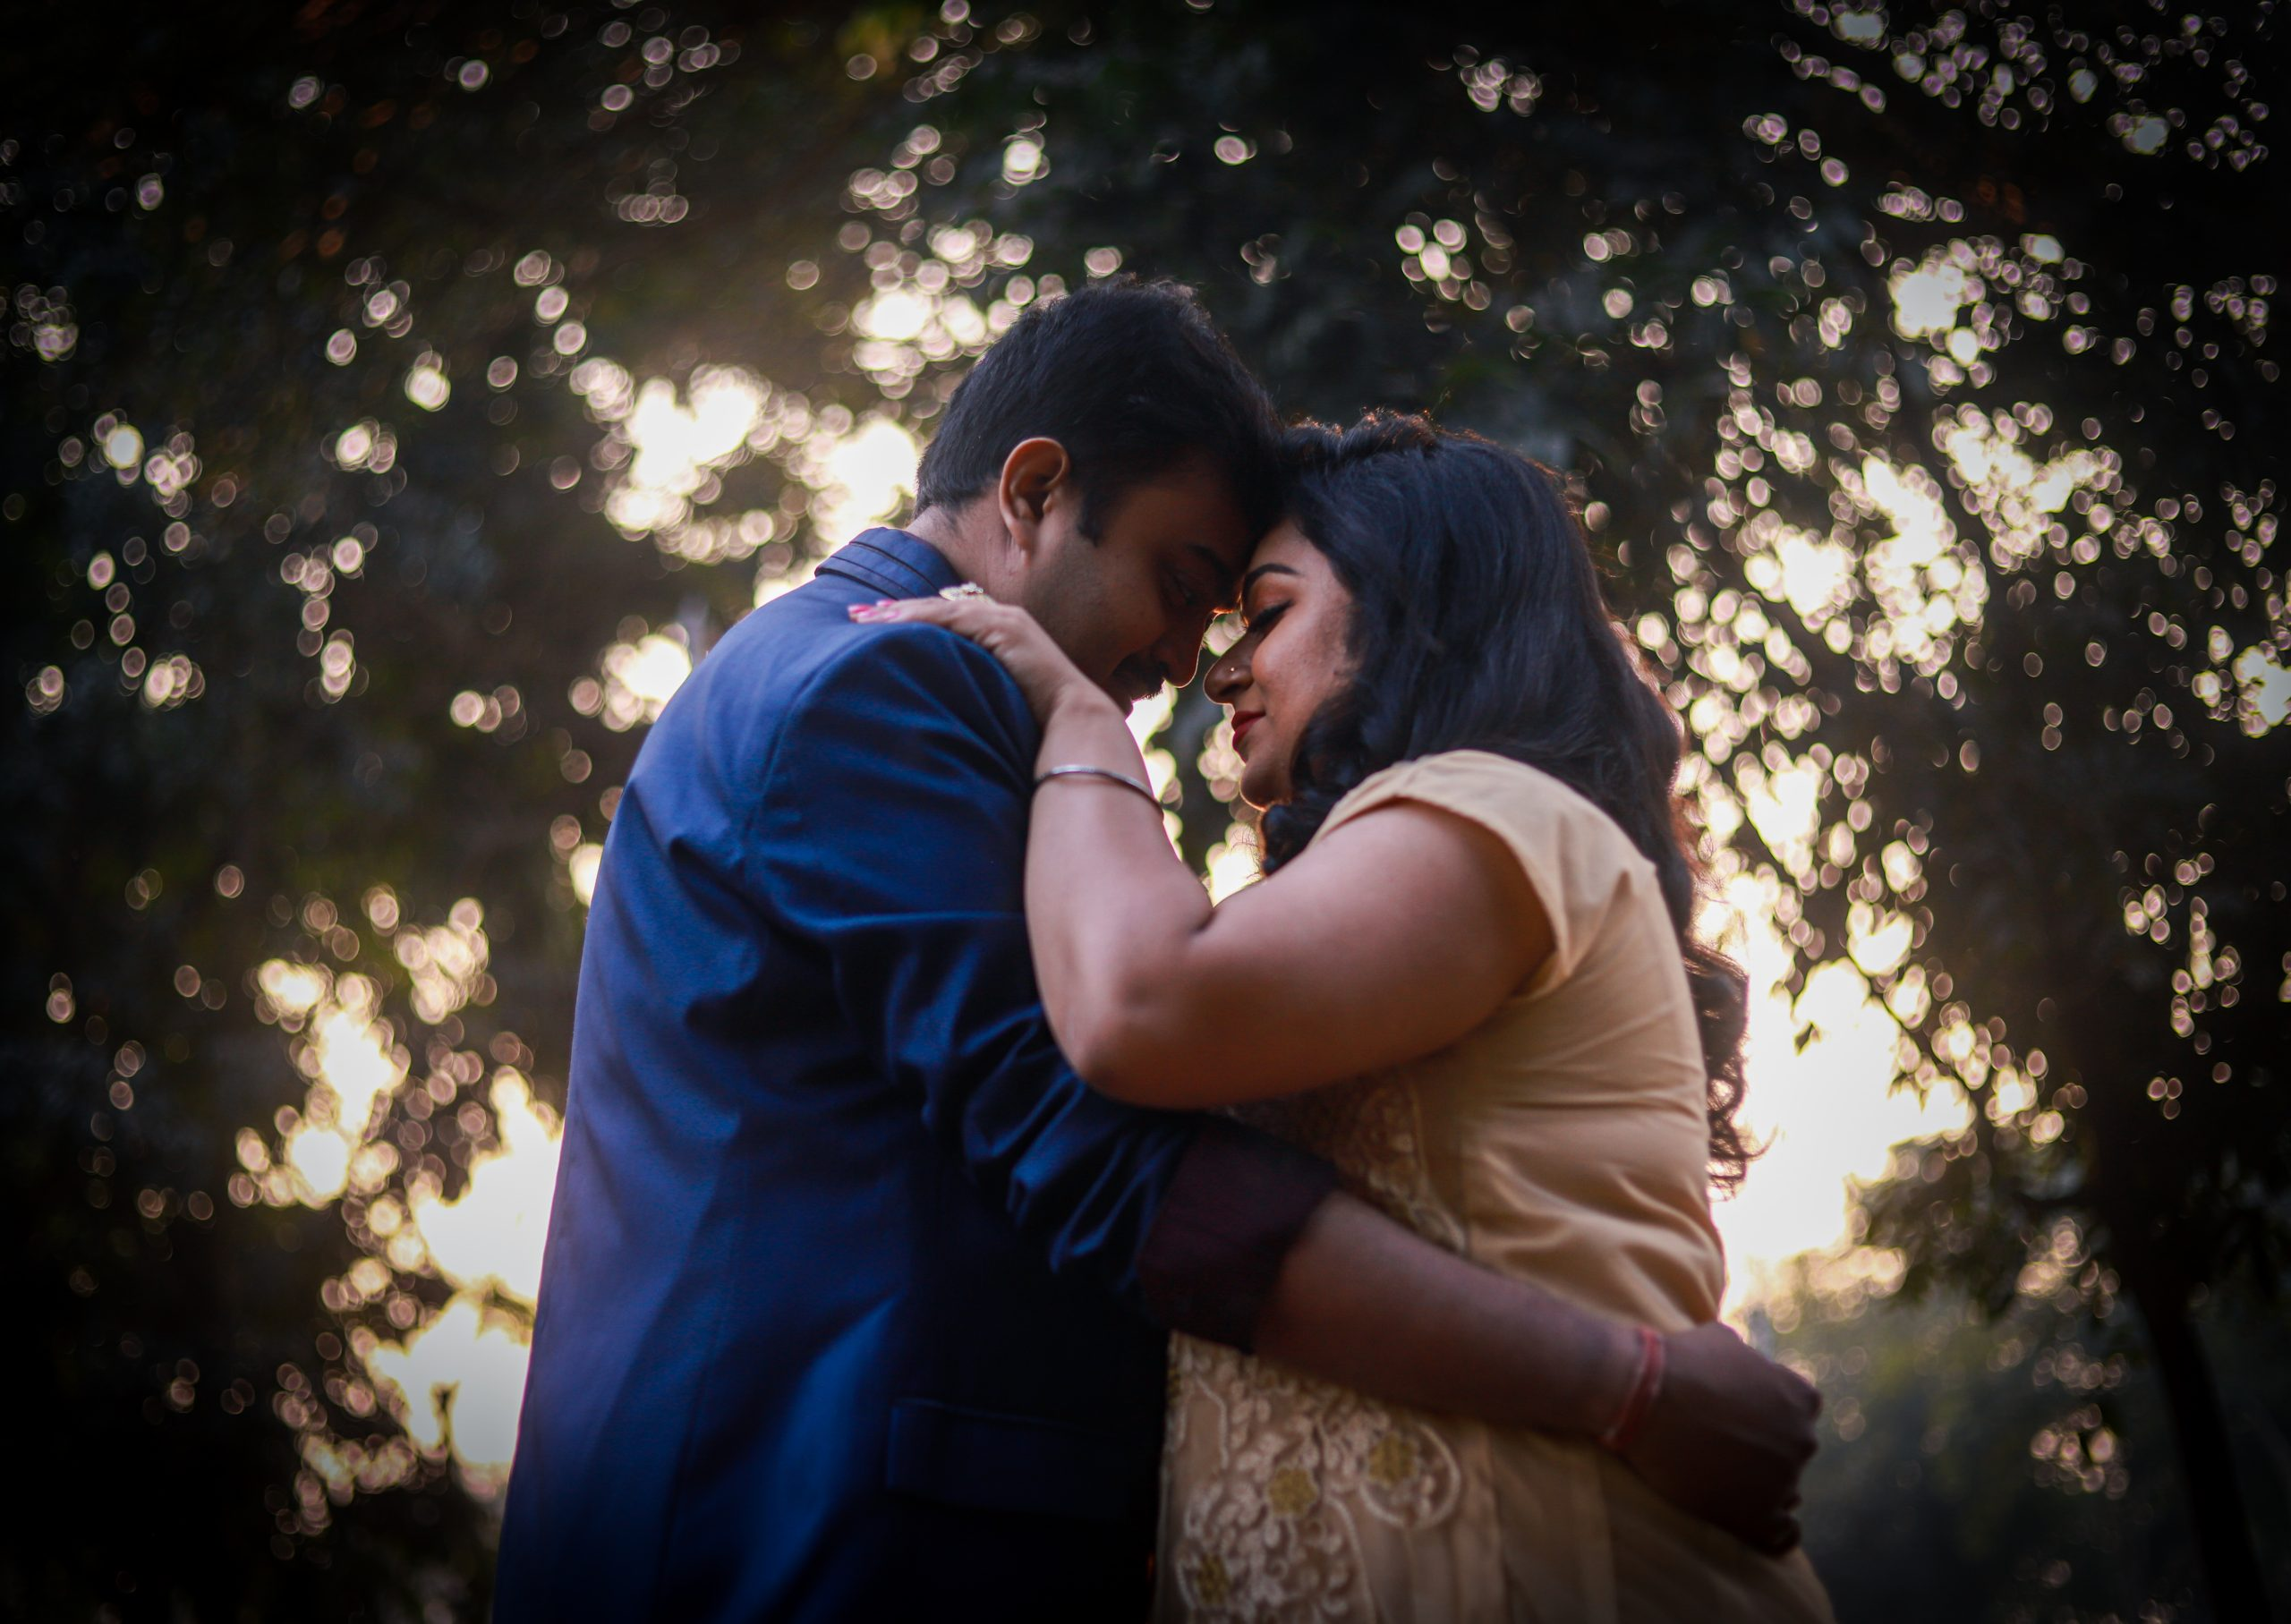 An Indian couple romance